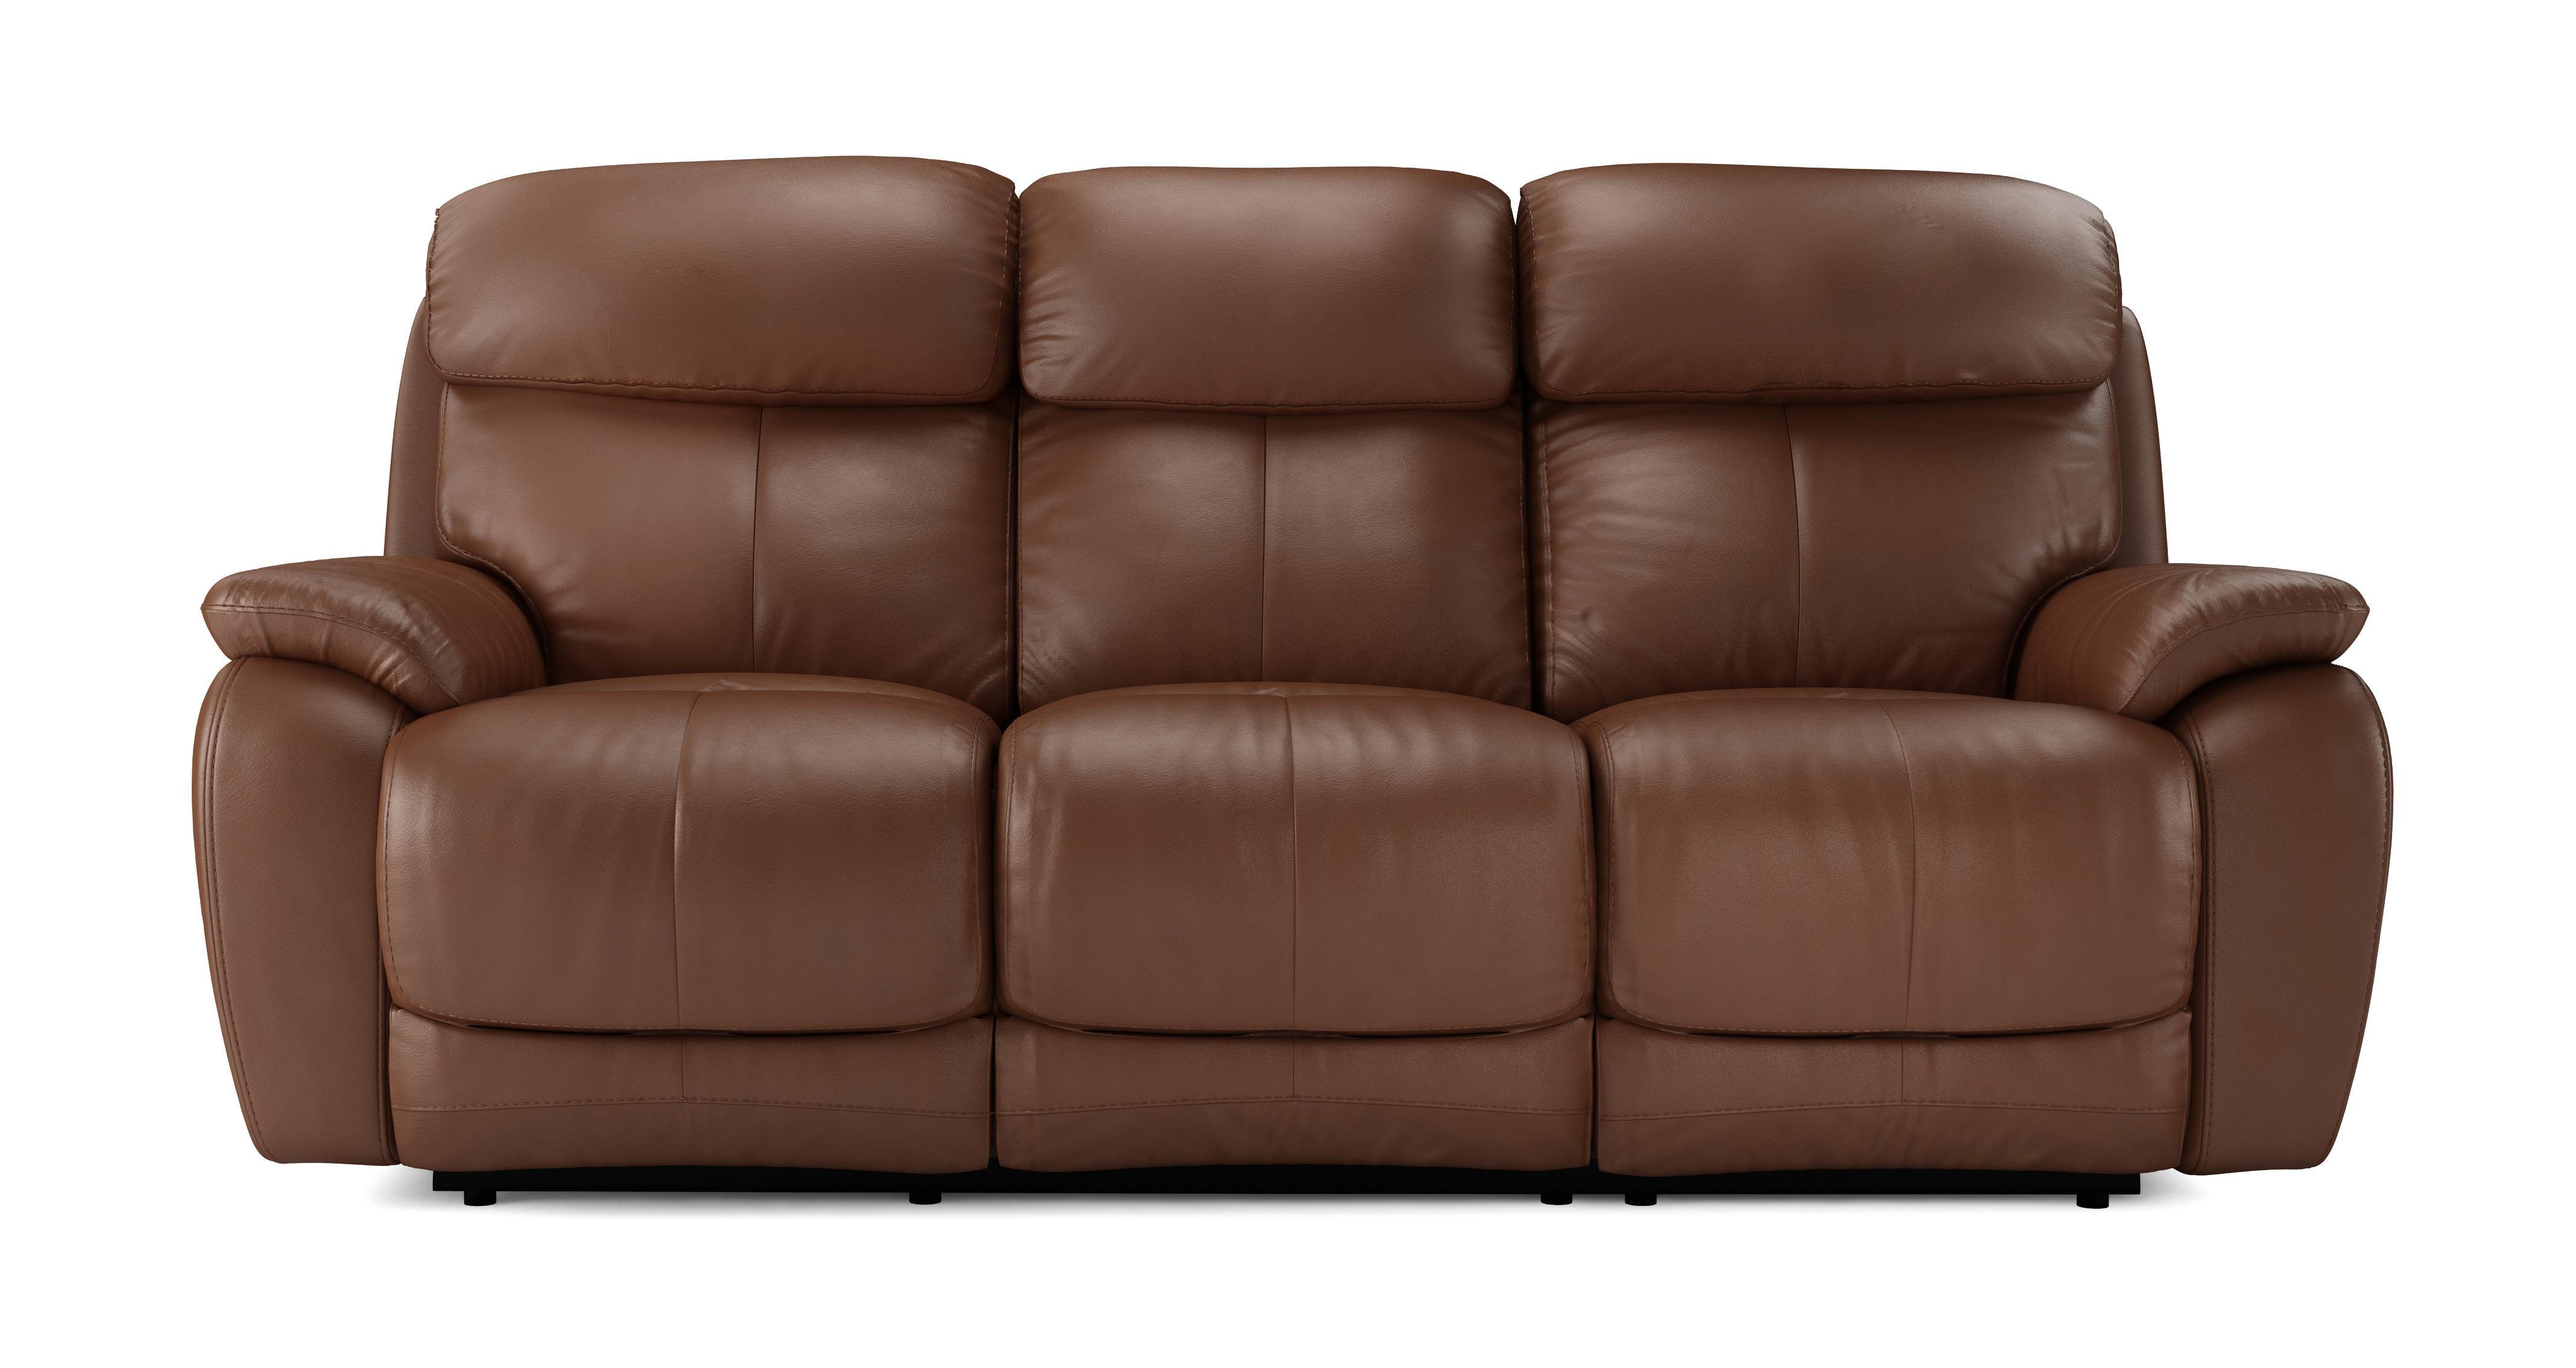 daytona 3 seater sofa peru dfs rh dfs co uk